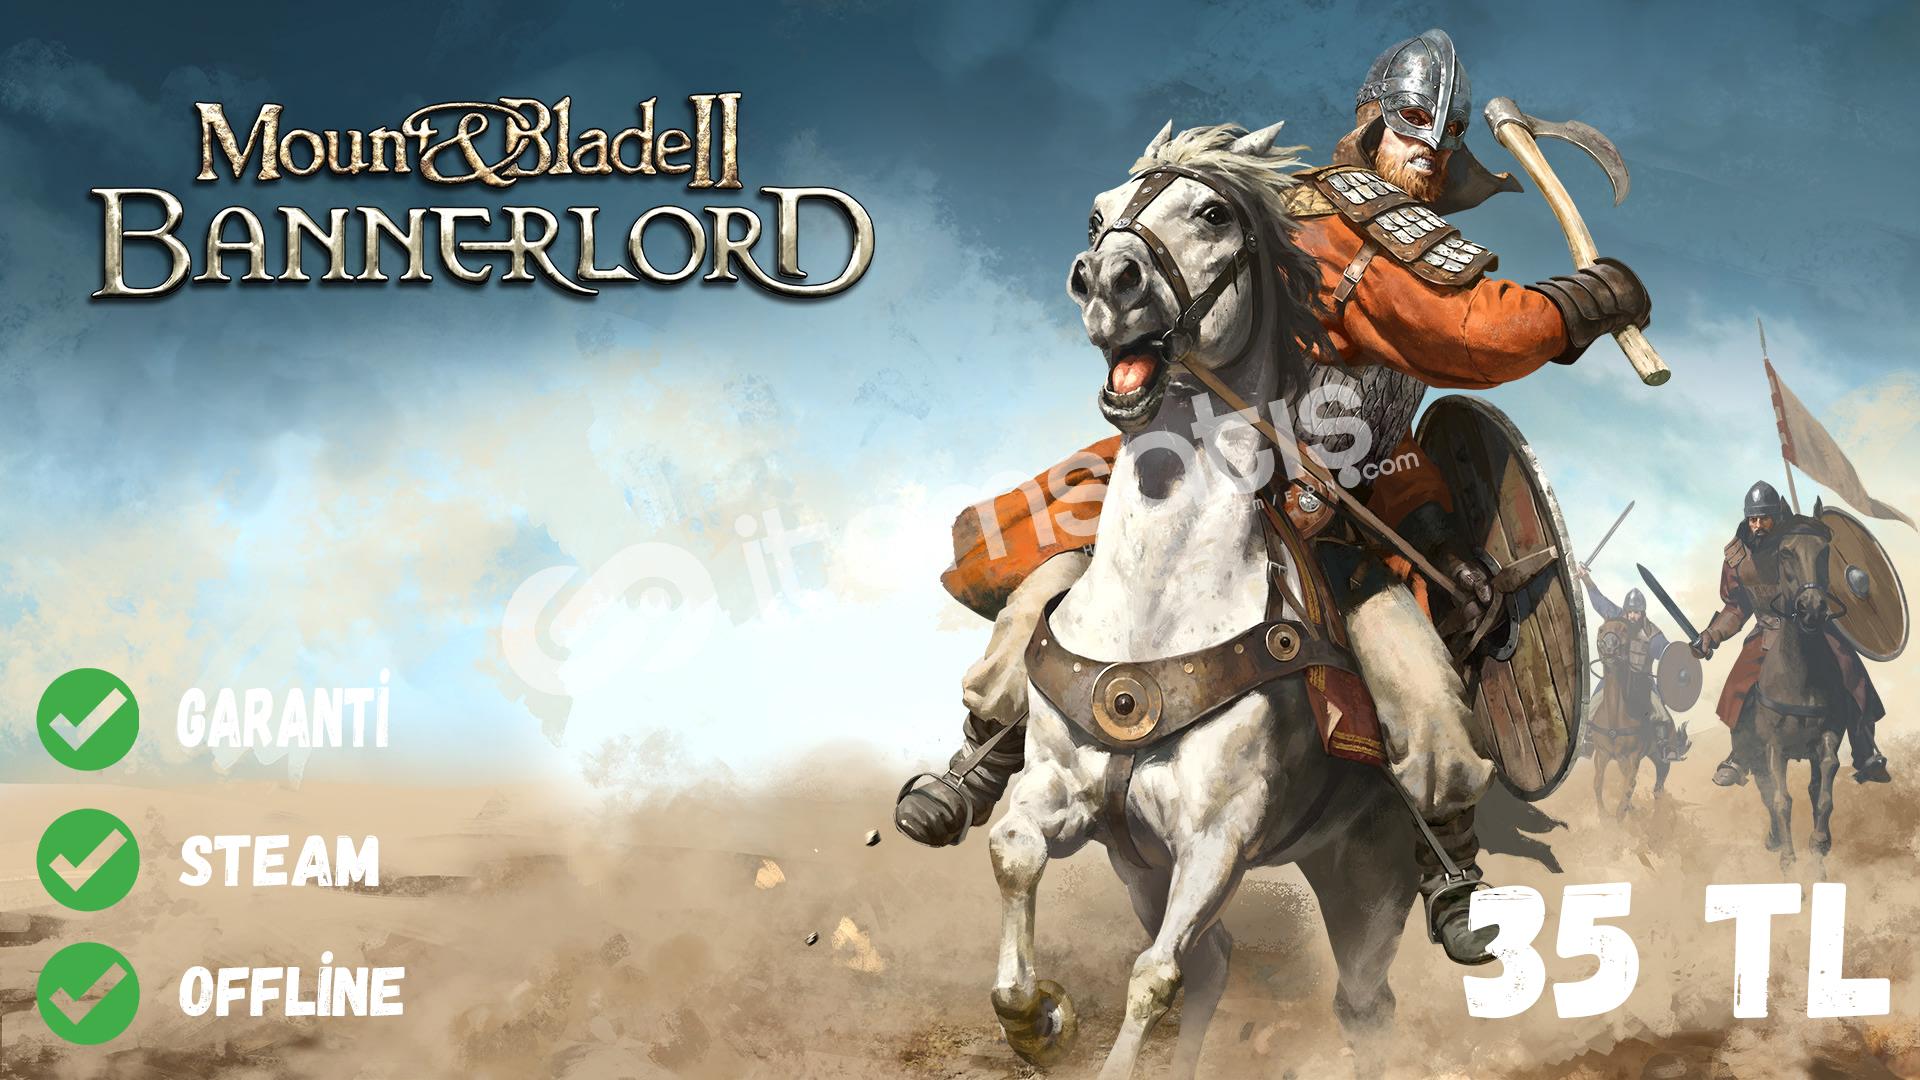 Mount And Blade Bannerlord + Garanti